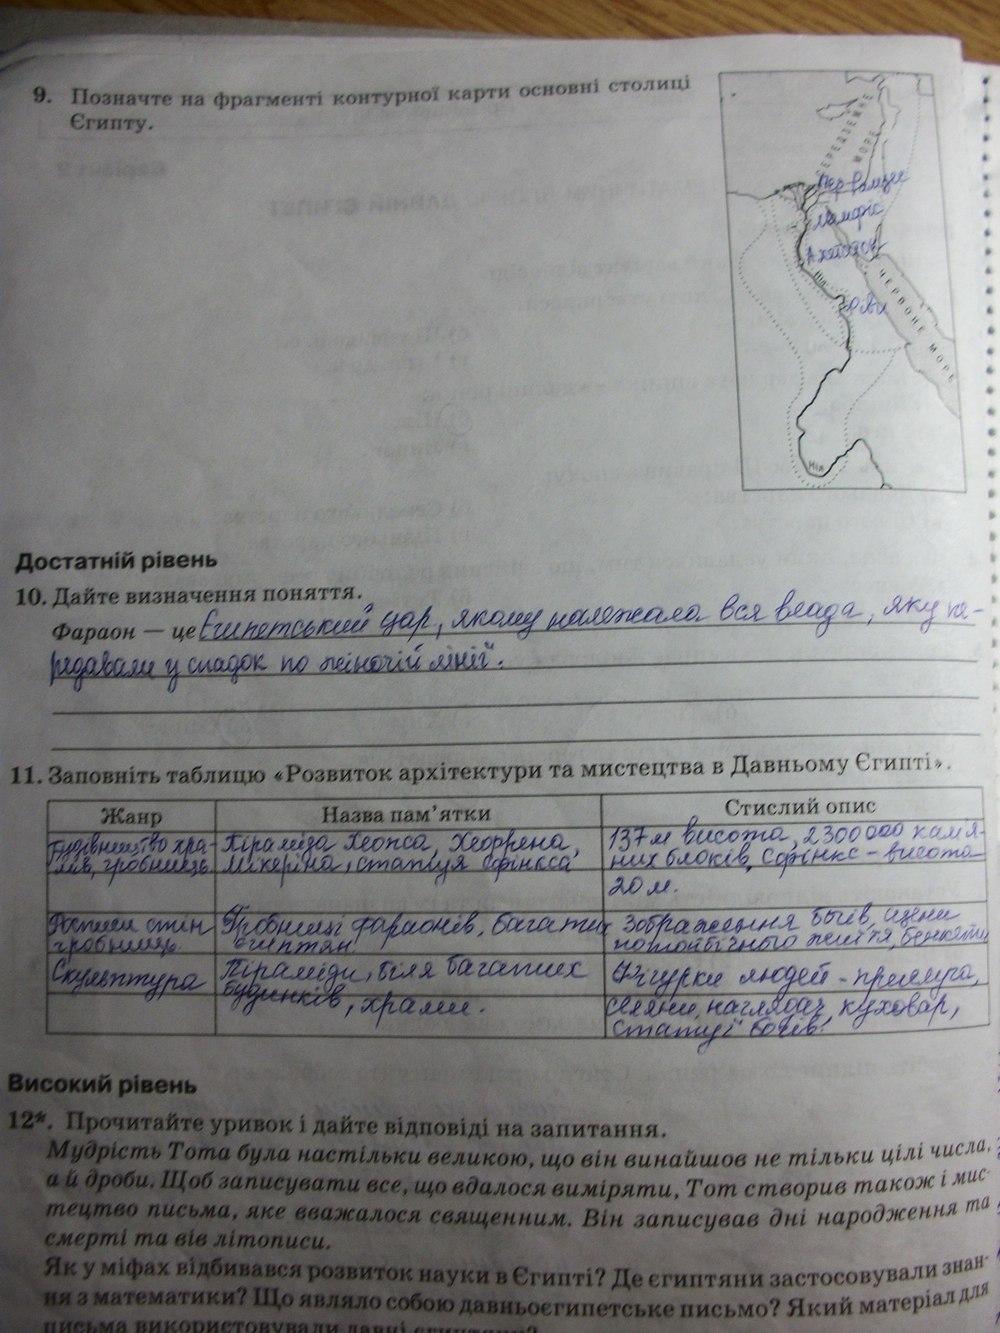 ГДЗ рабочие тетради 6 класс. Задание: стр. 10